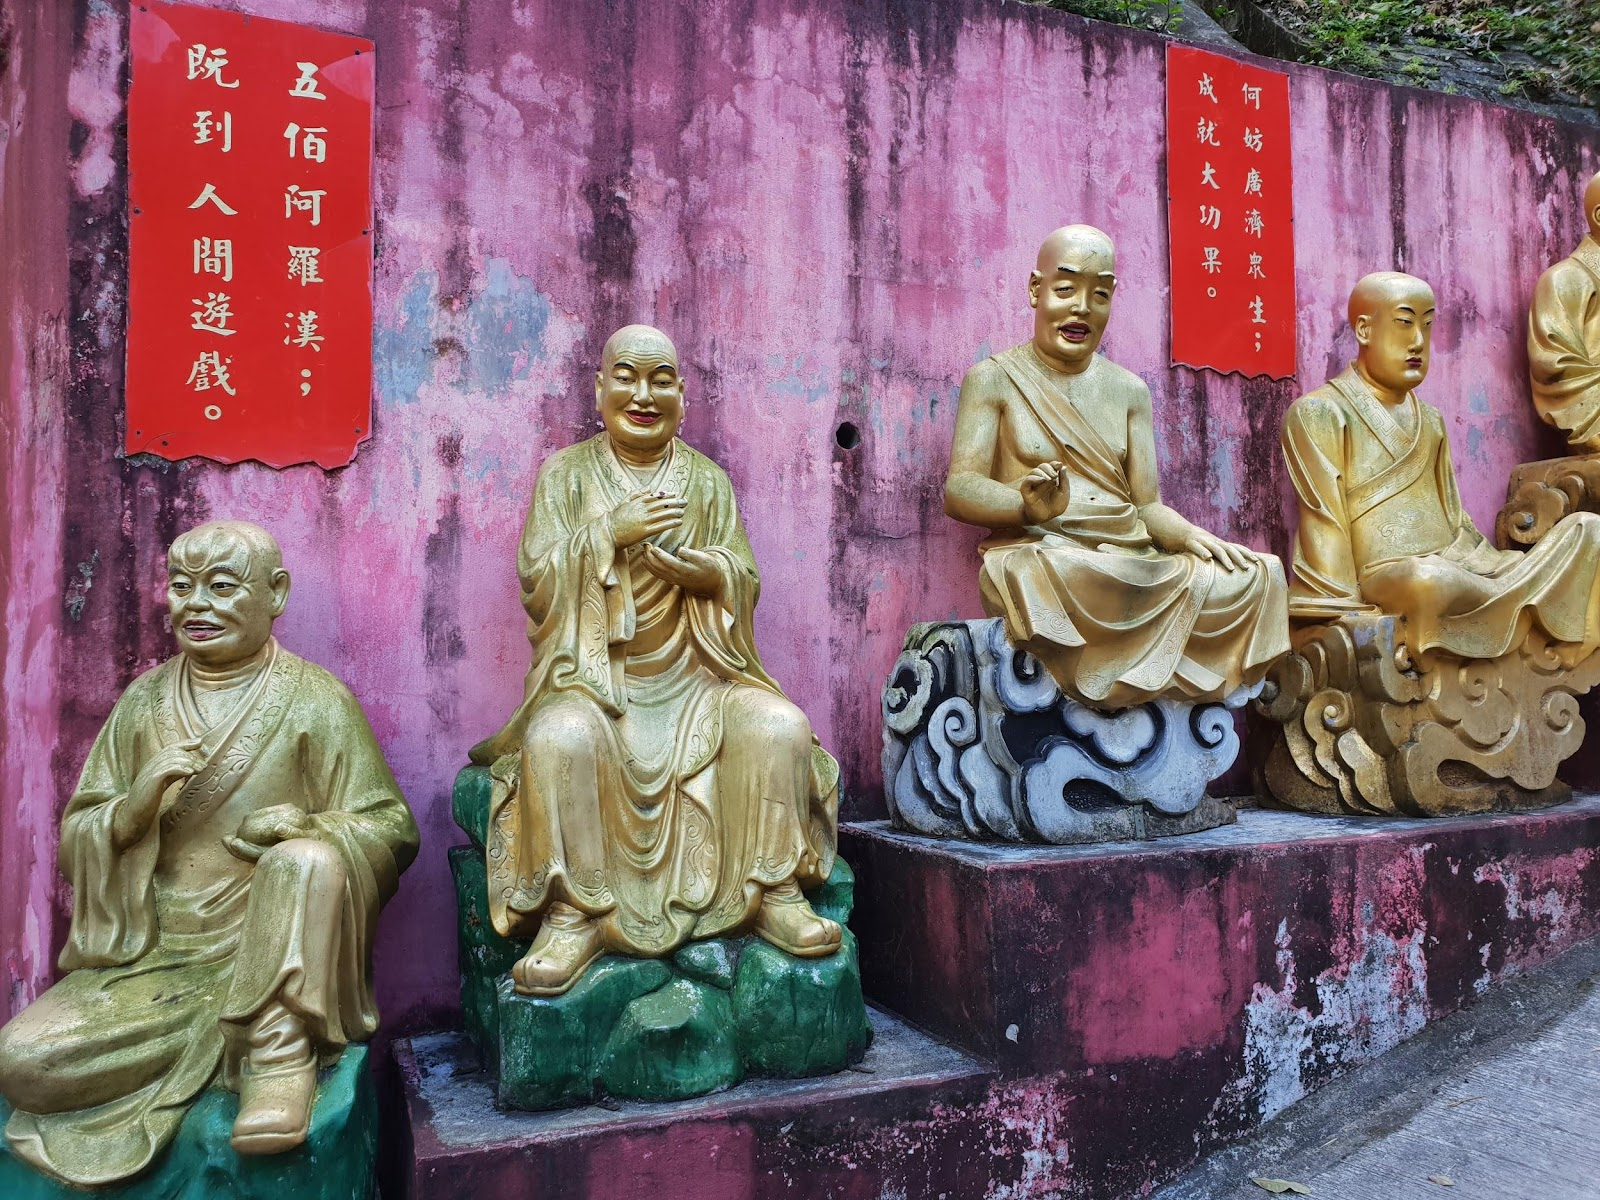 10000 buddhas monastery